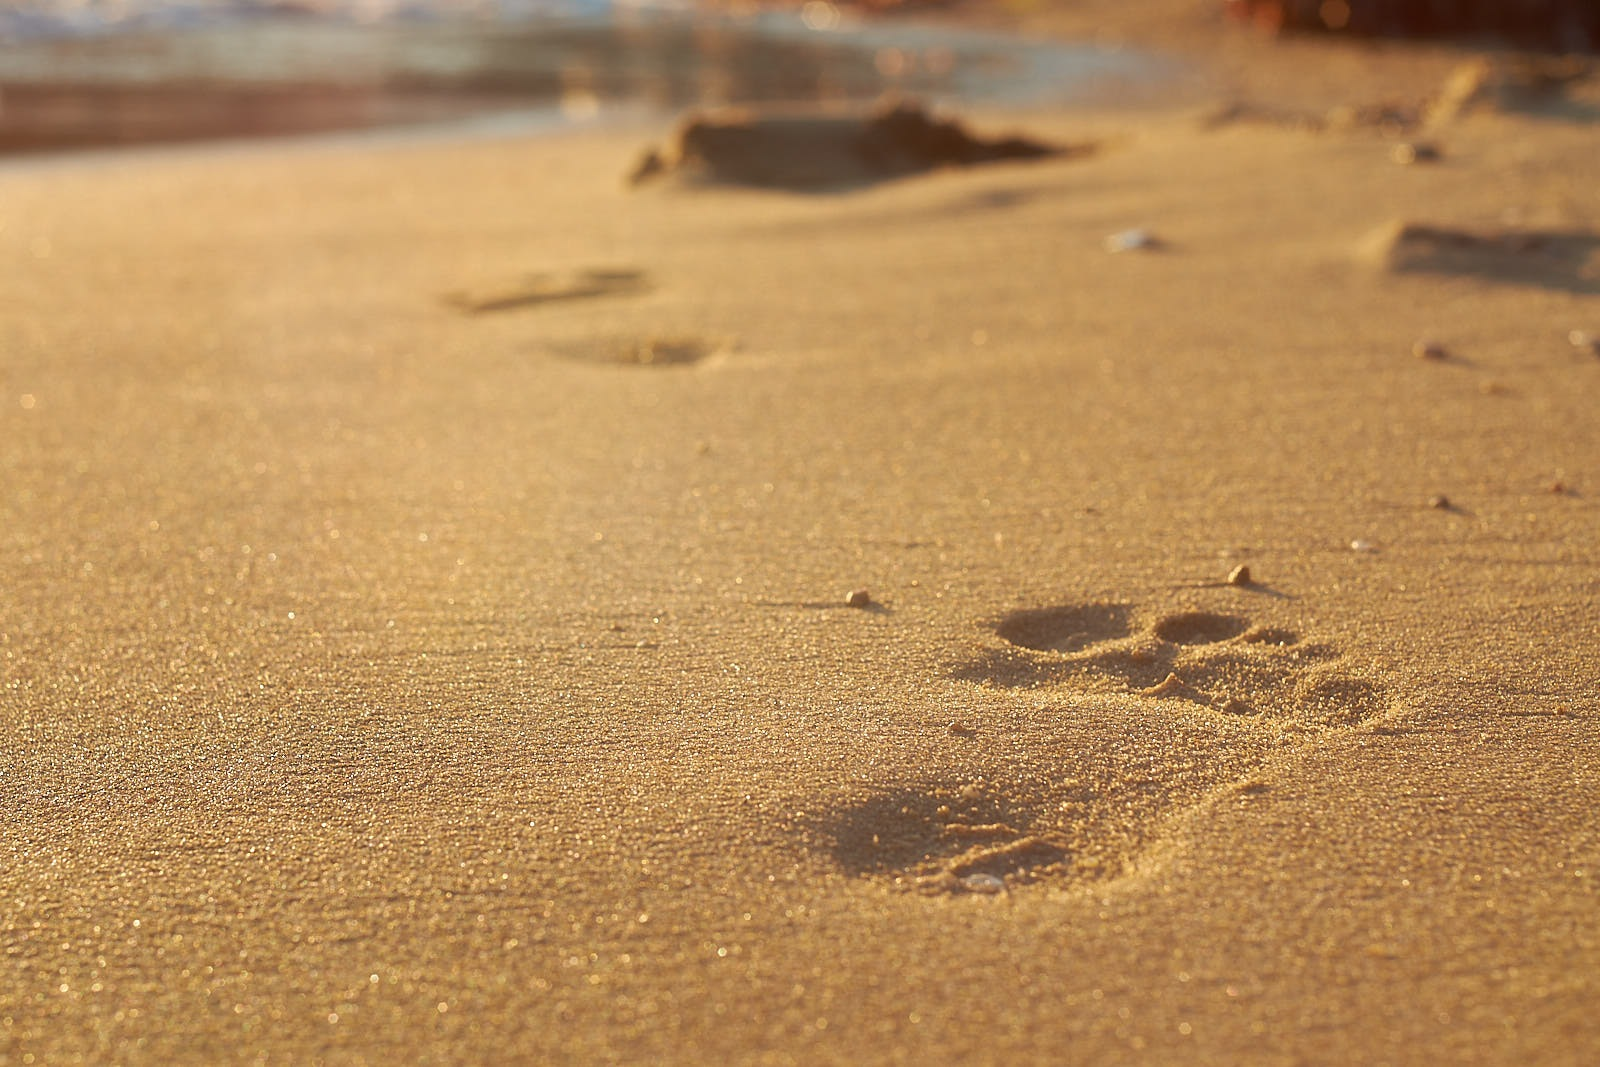 Footprints in the Sand by Zoran Rilak